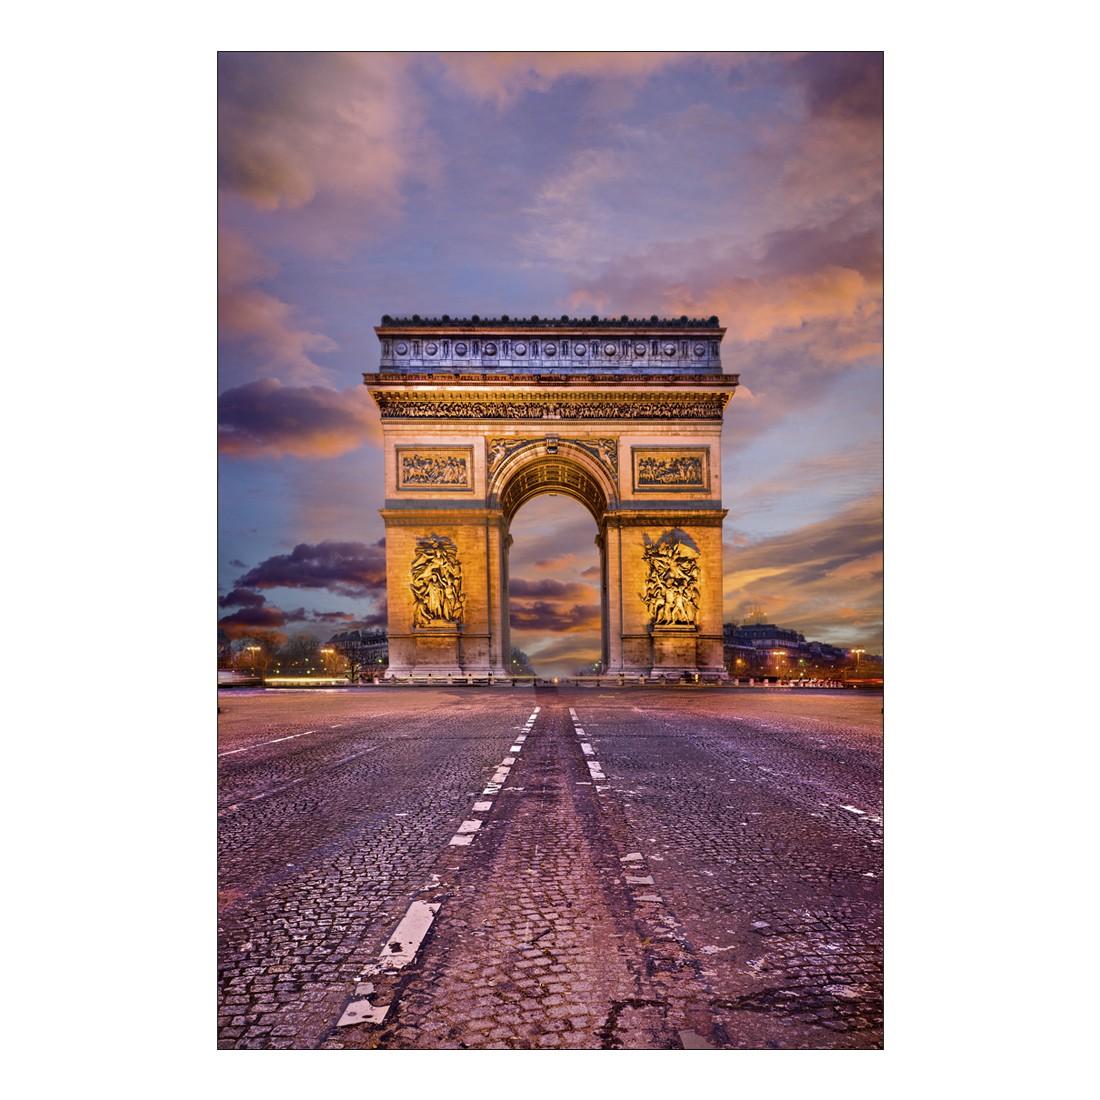 Acrylglasbild L'Arc de Triomphe Paris at Night – Abmessung 30×20 cm, Gallery of Innovative Art bestellen